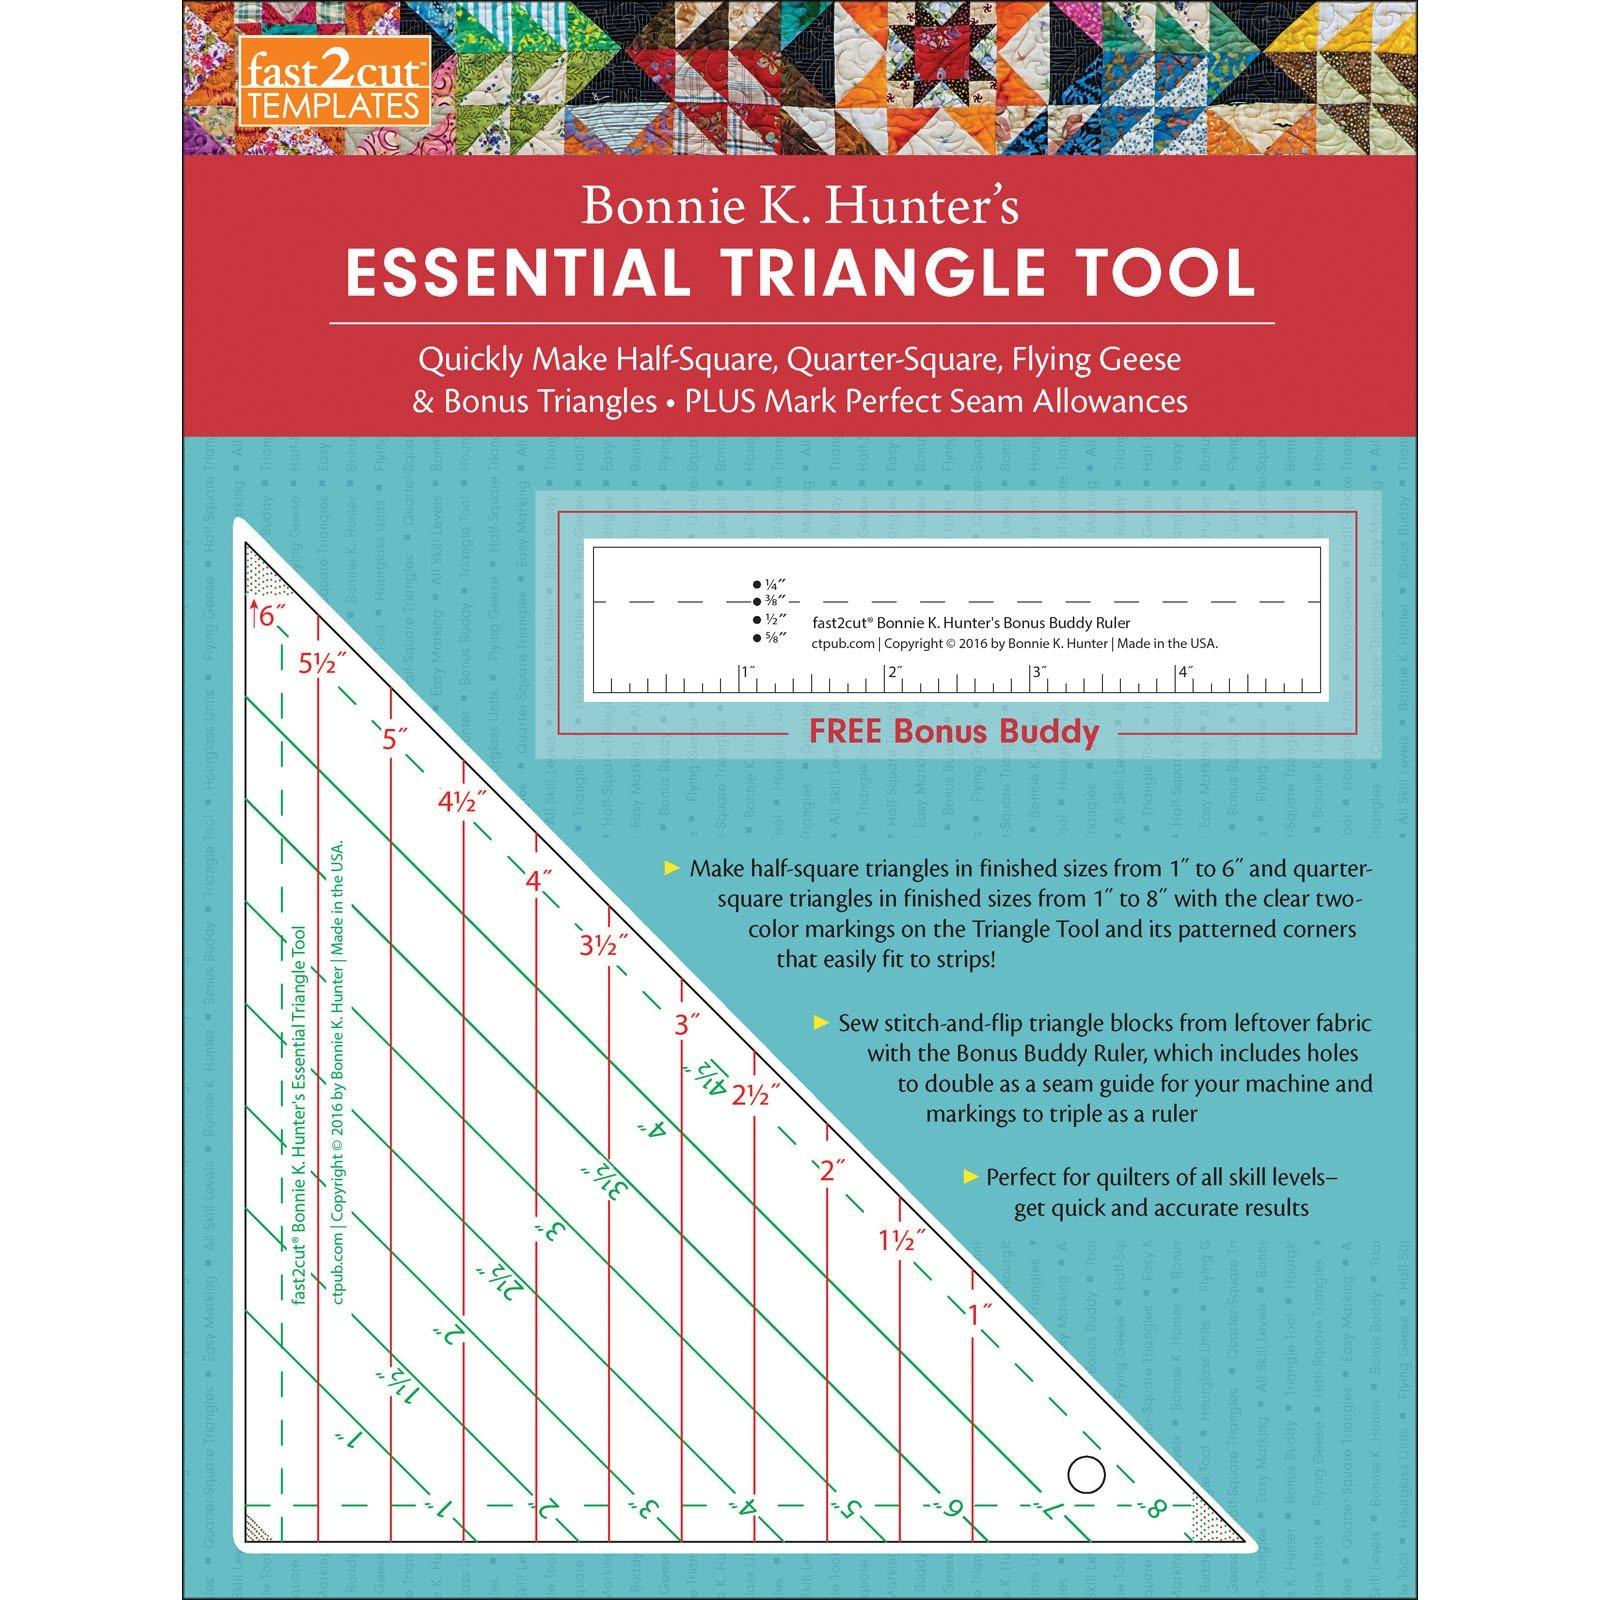 Essential Triangle Tool